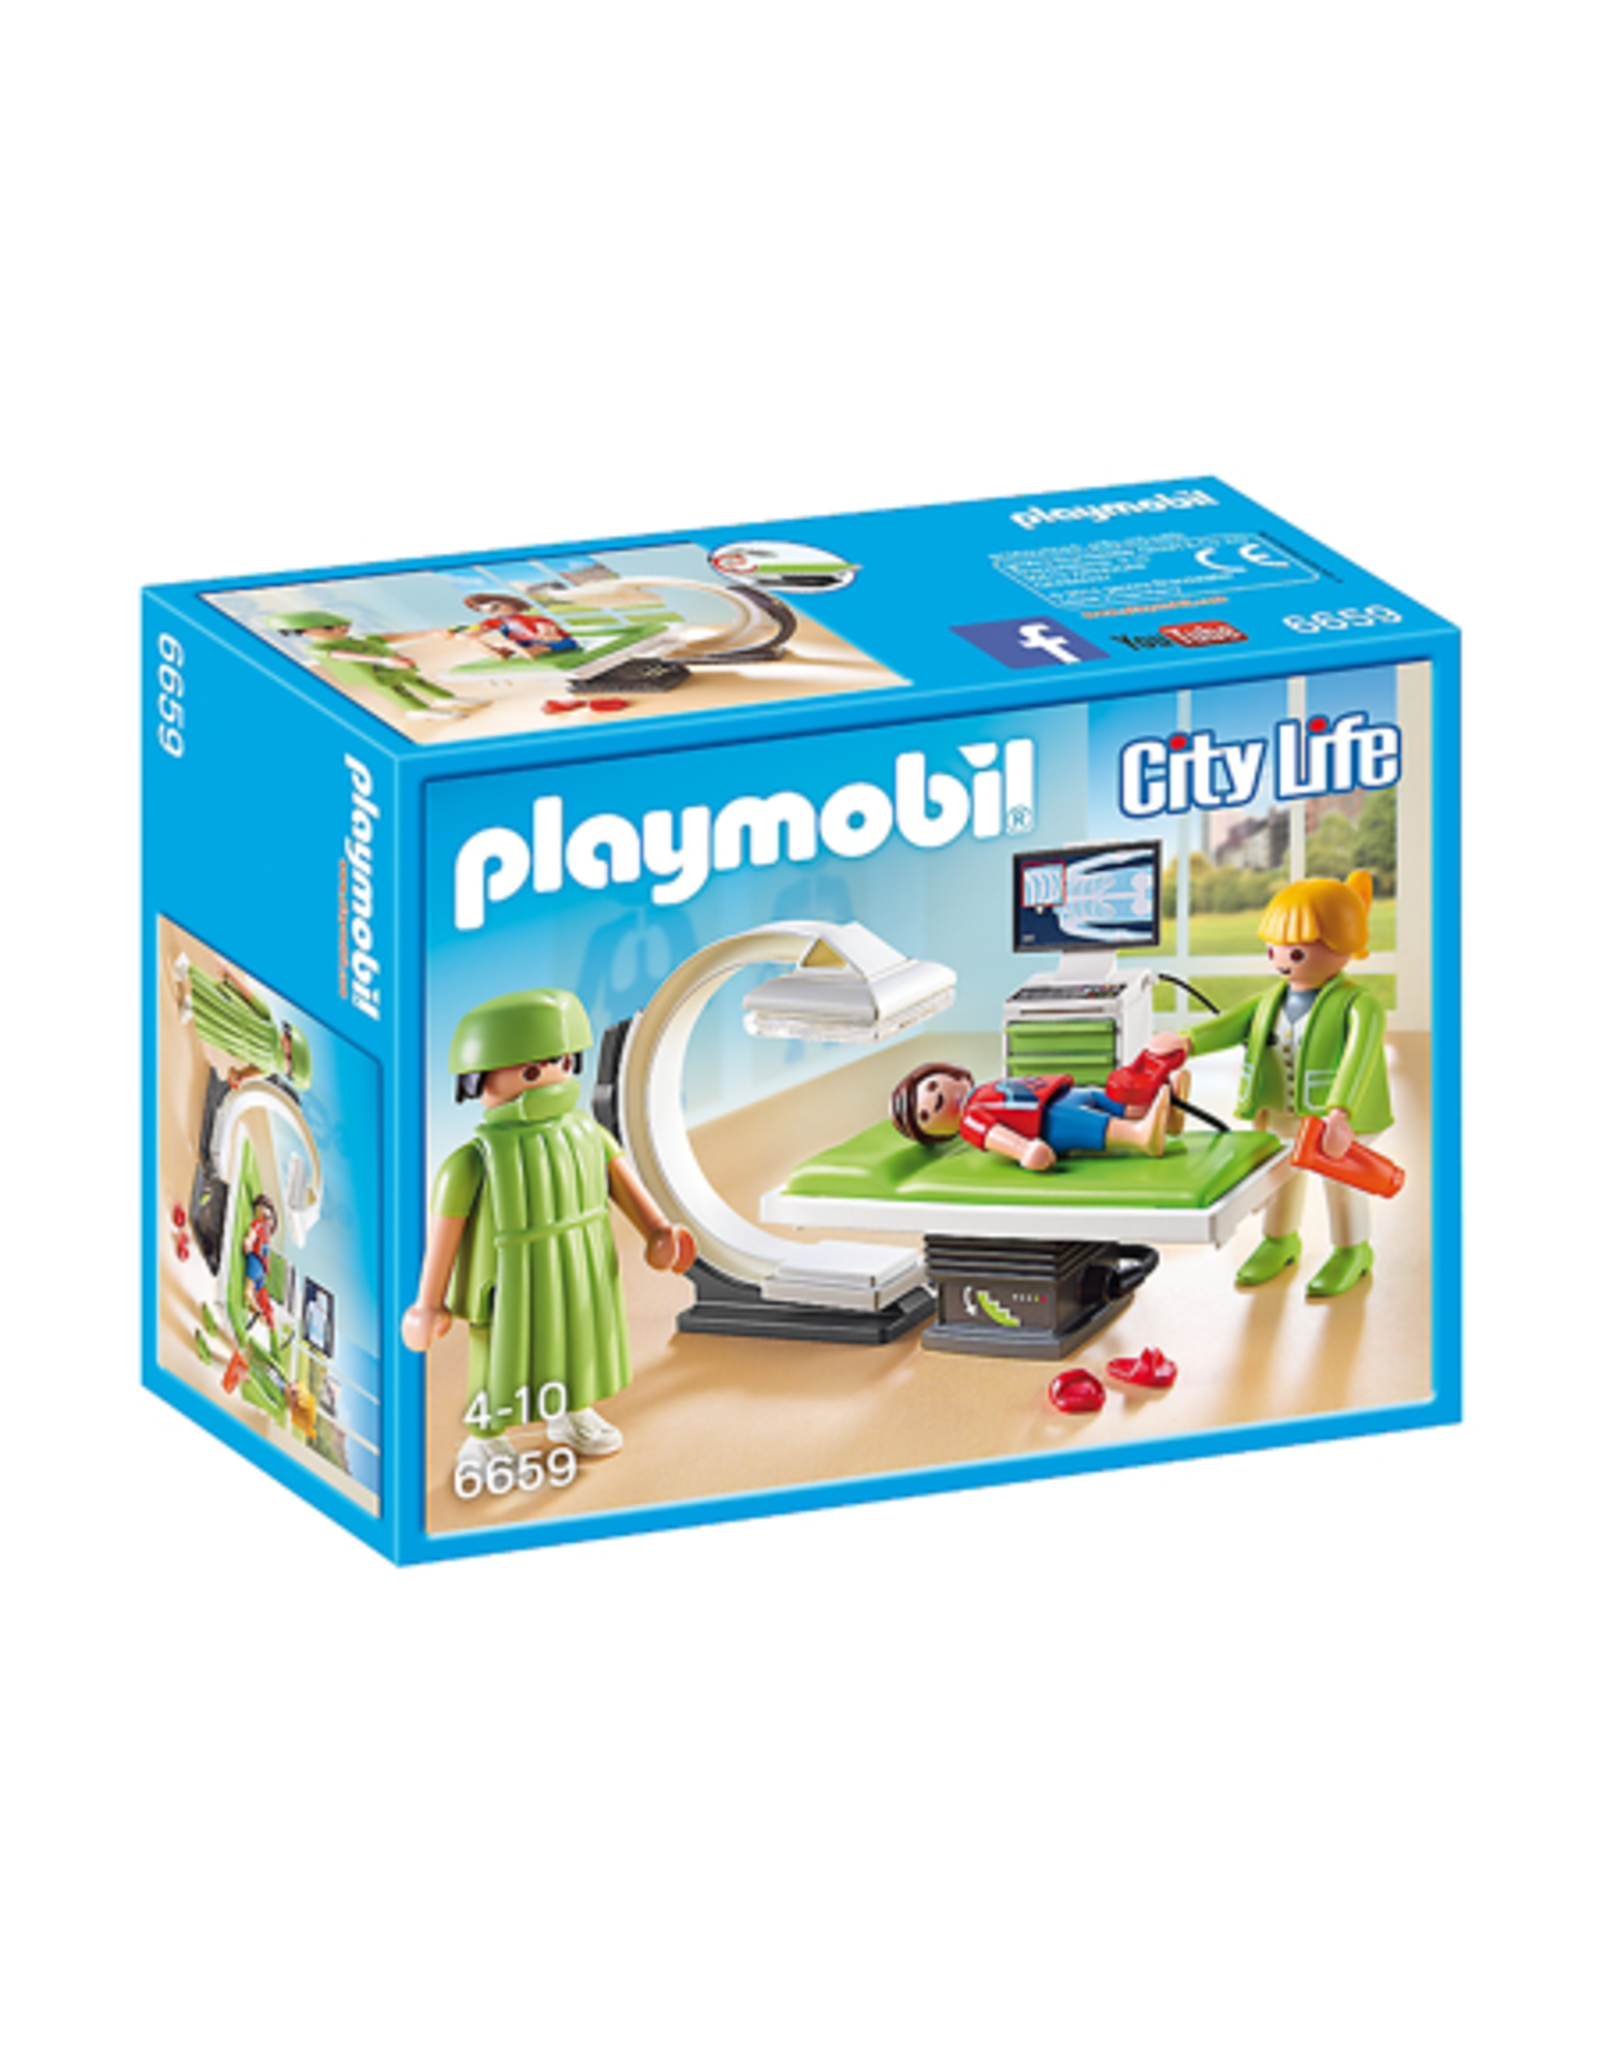 Playmobil X-Ray Room